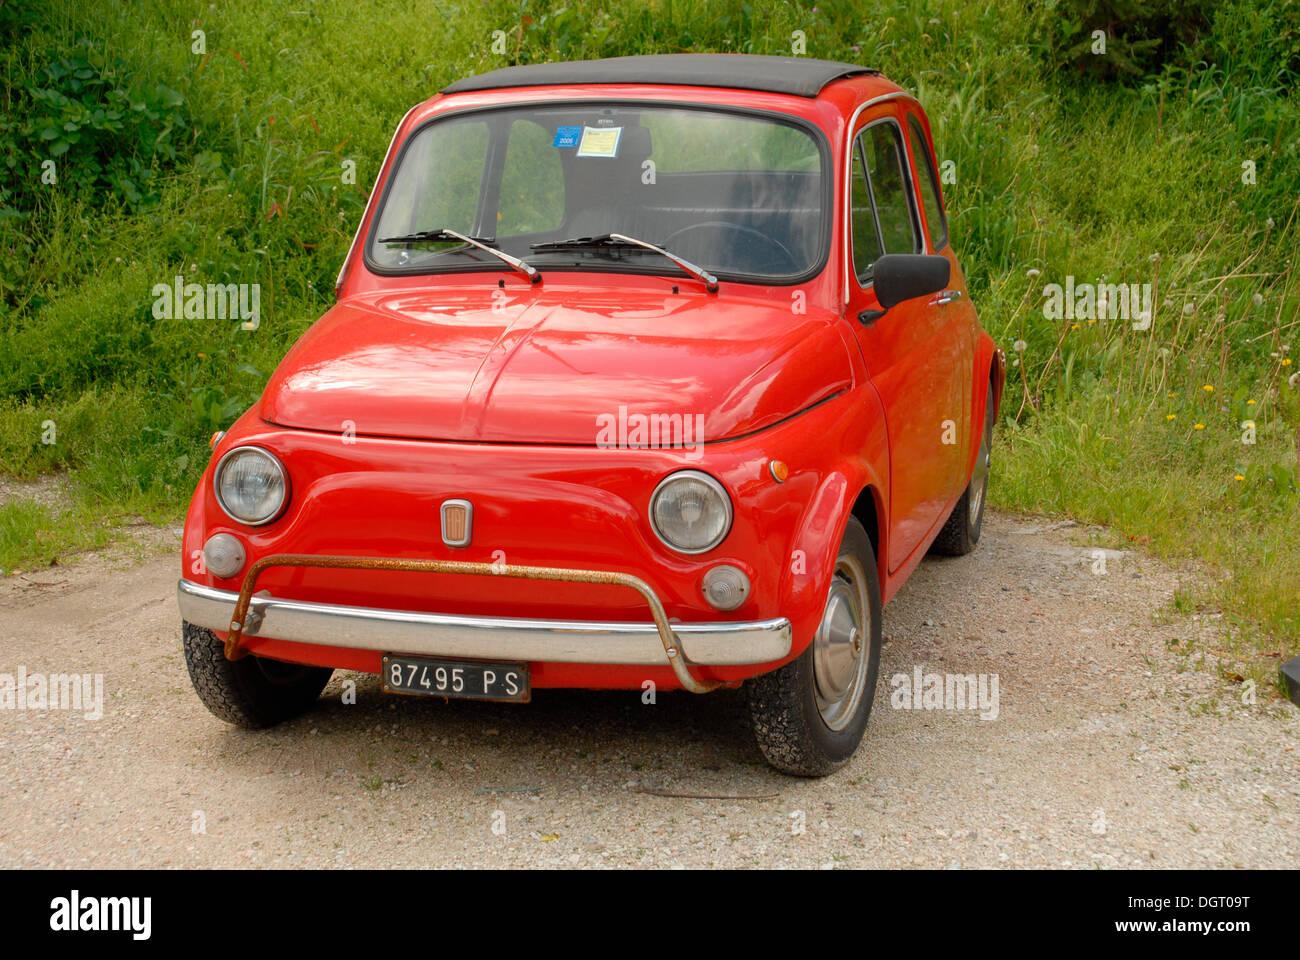 old fiat 500 classic car pesaro italy europe stock. Black Bedroom Furniture Sets. Home Design Ideas